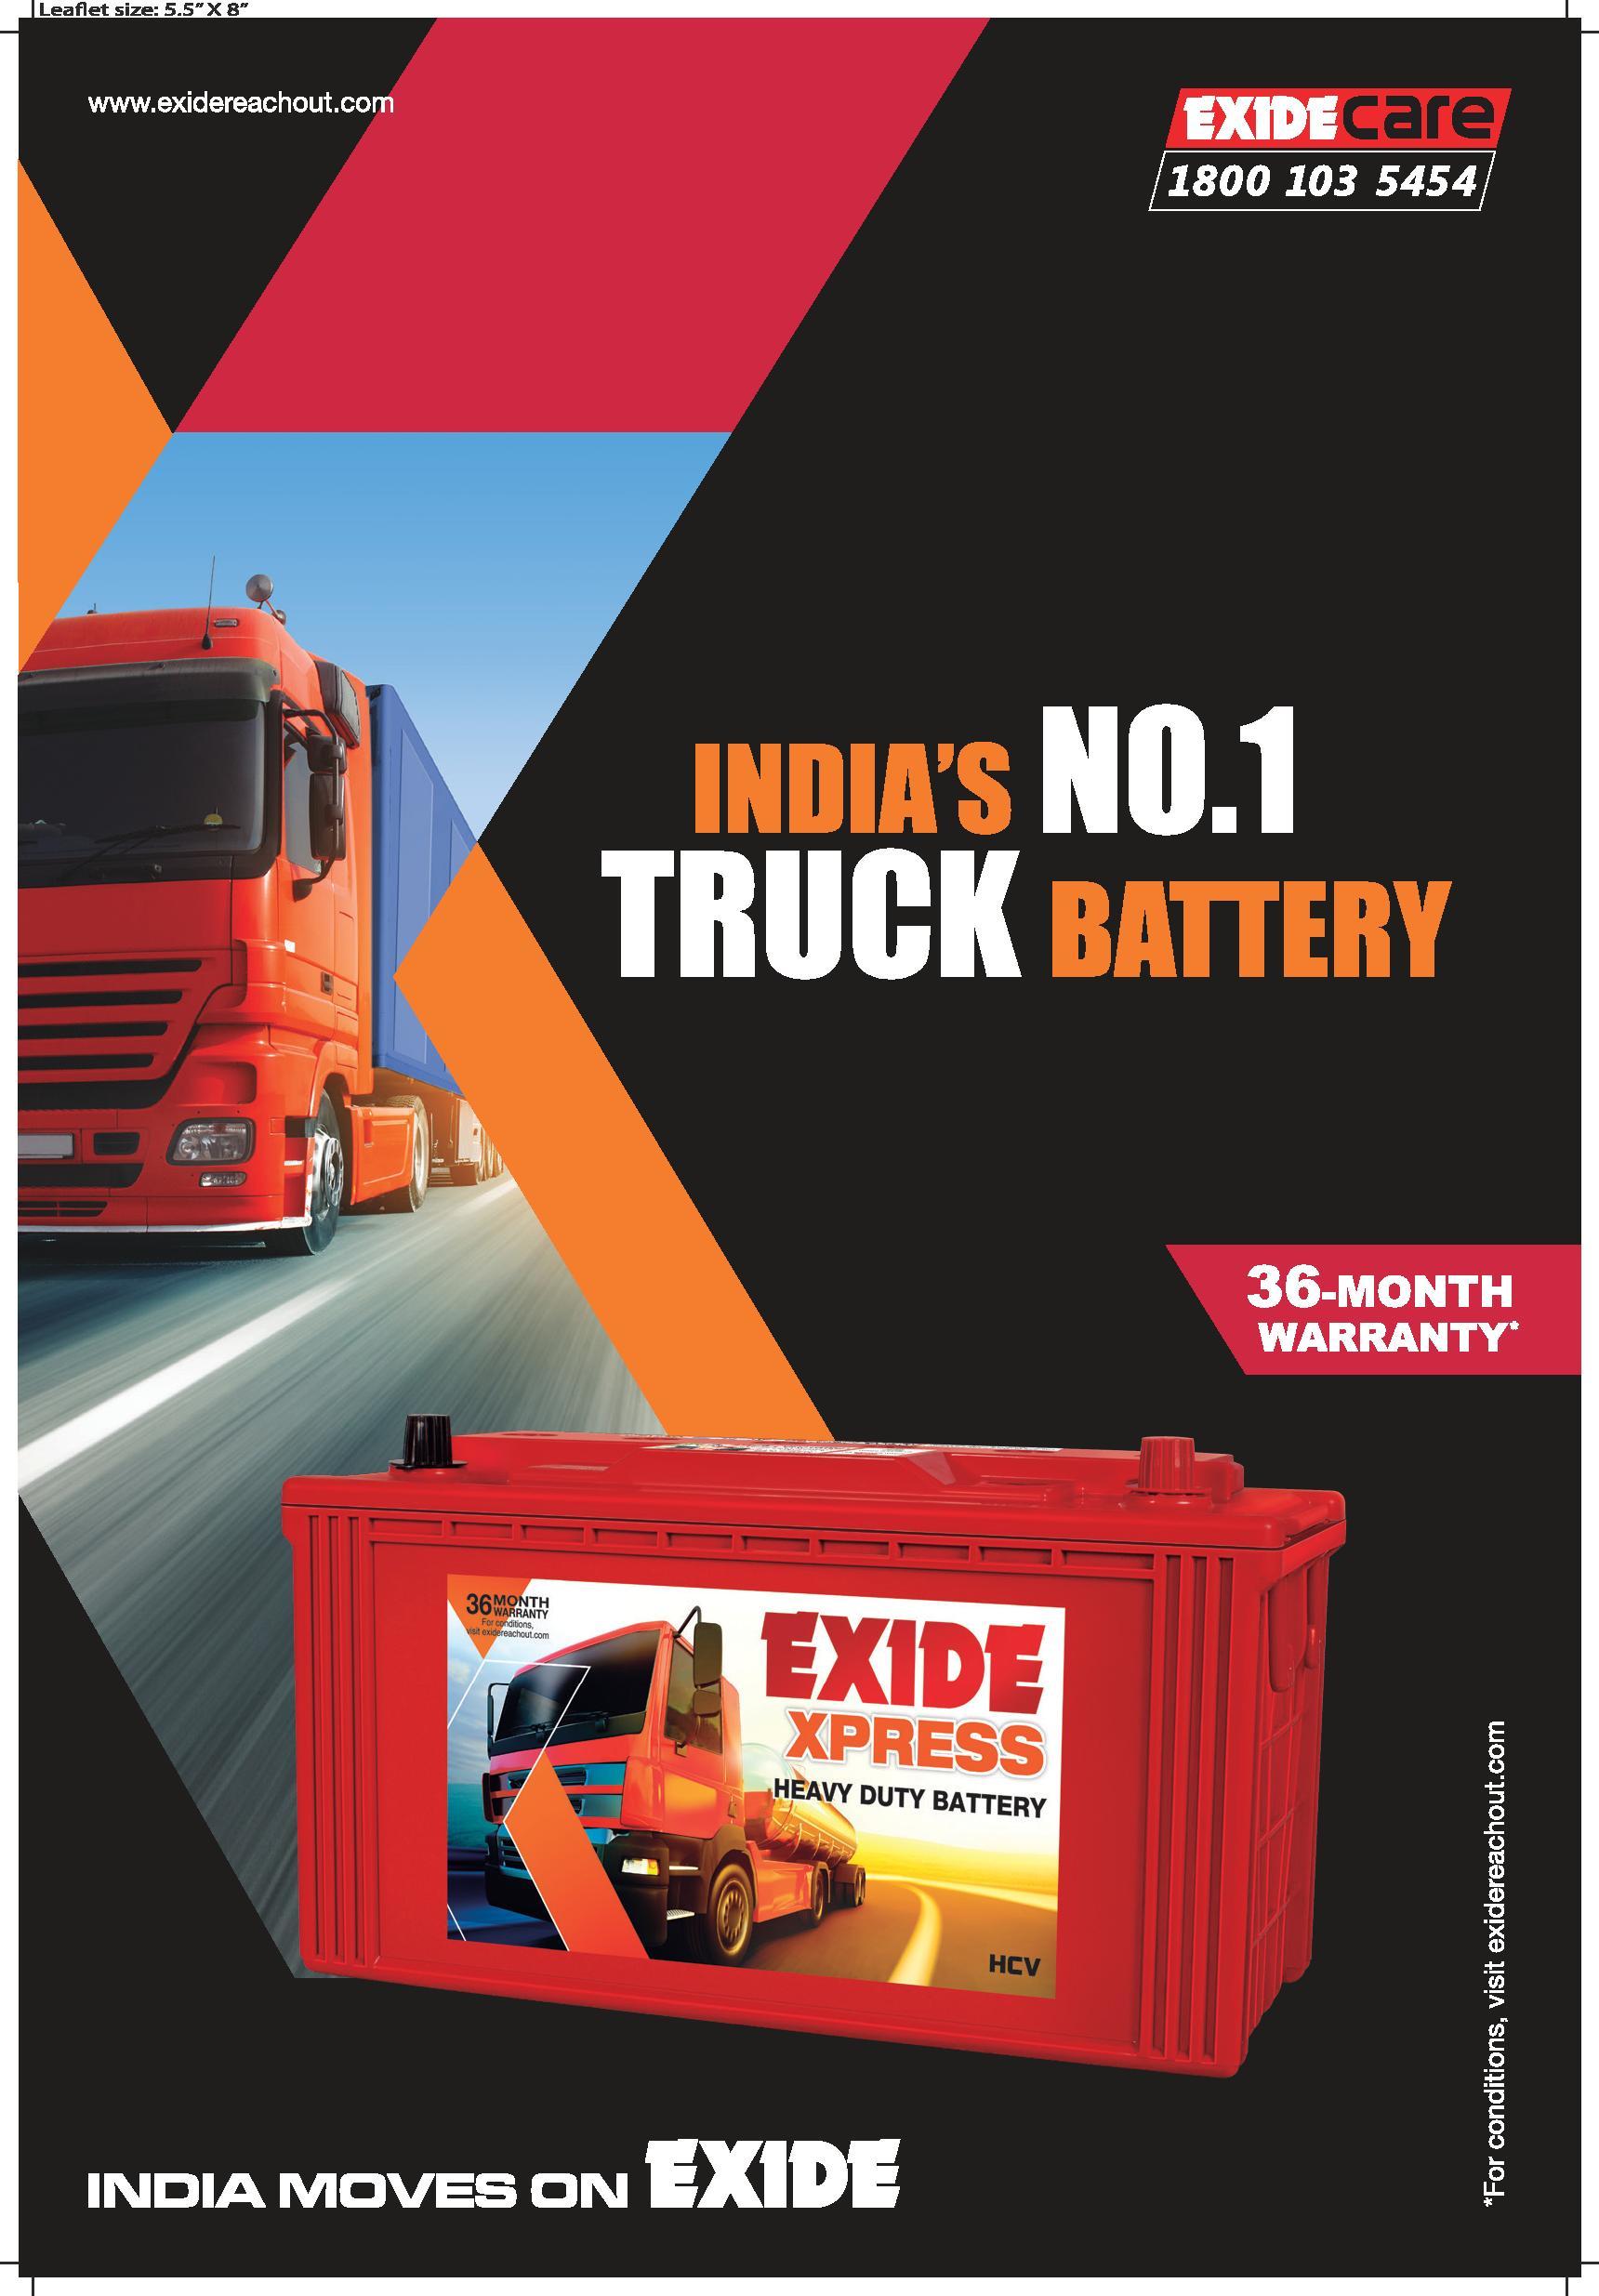 Exide Xpress Truck Battery